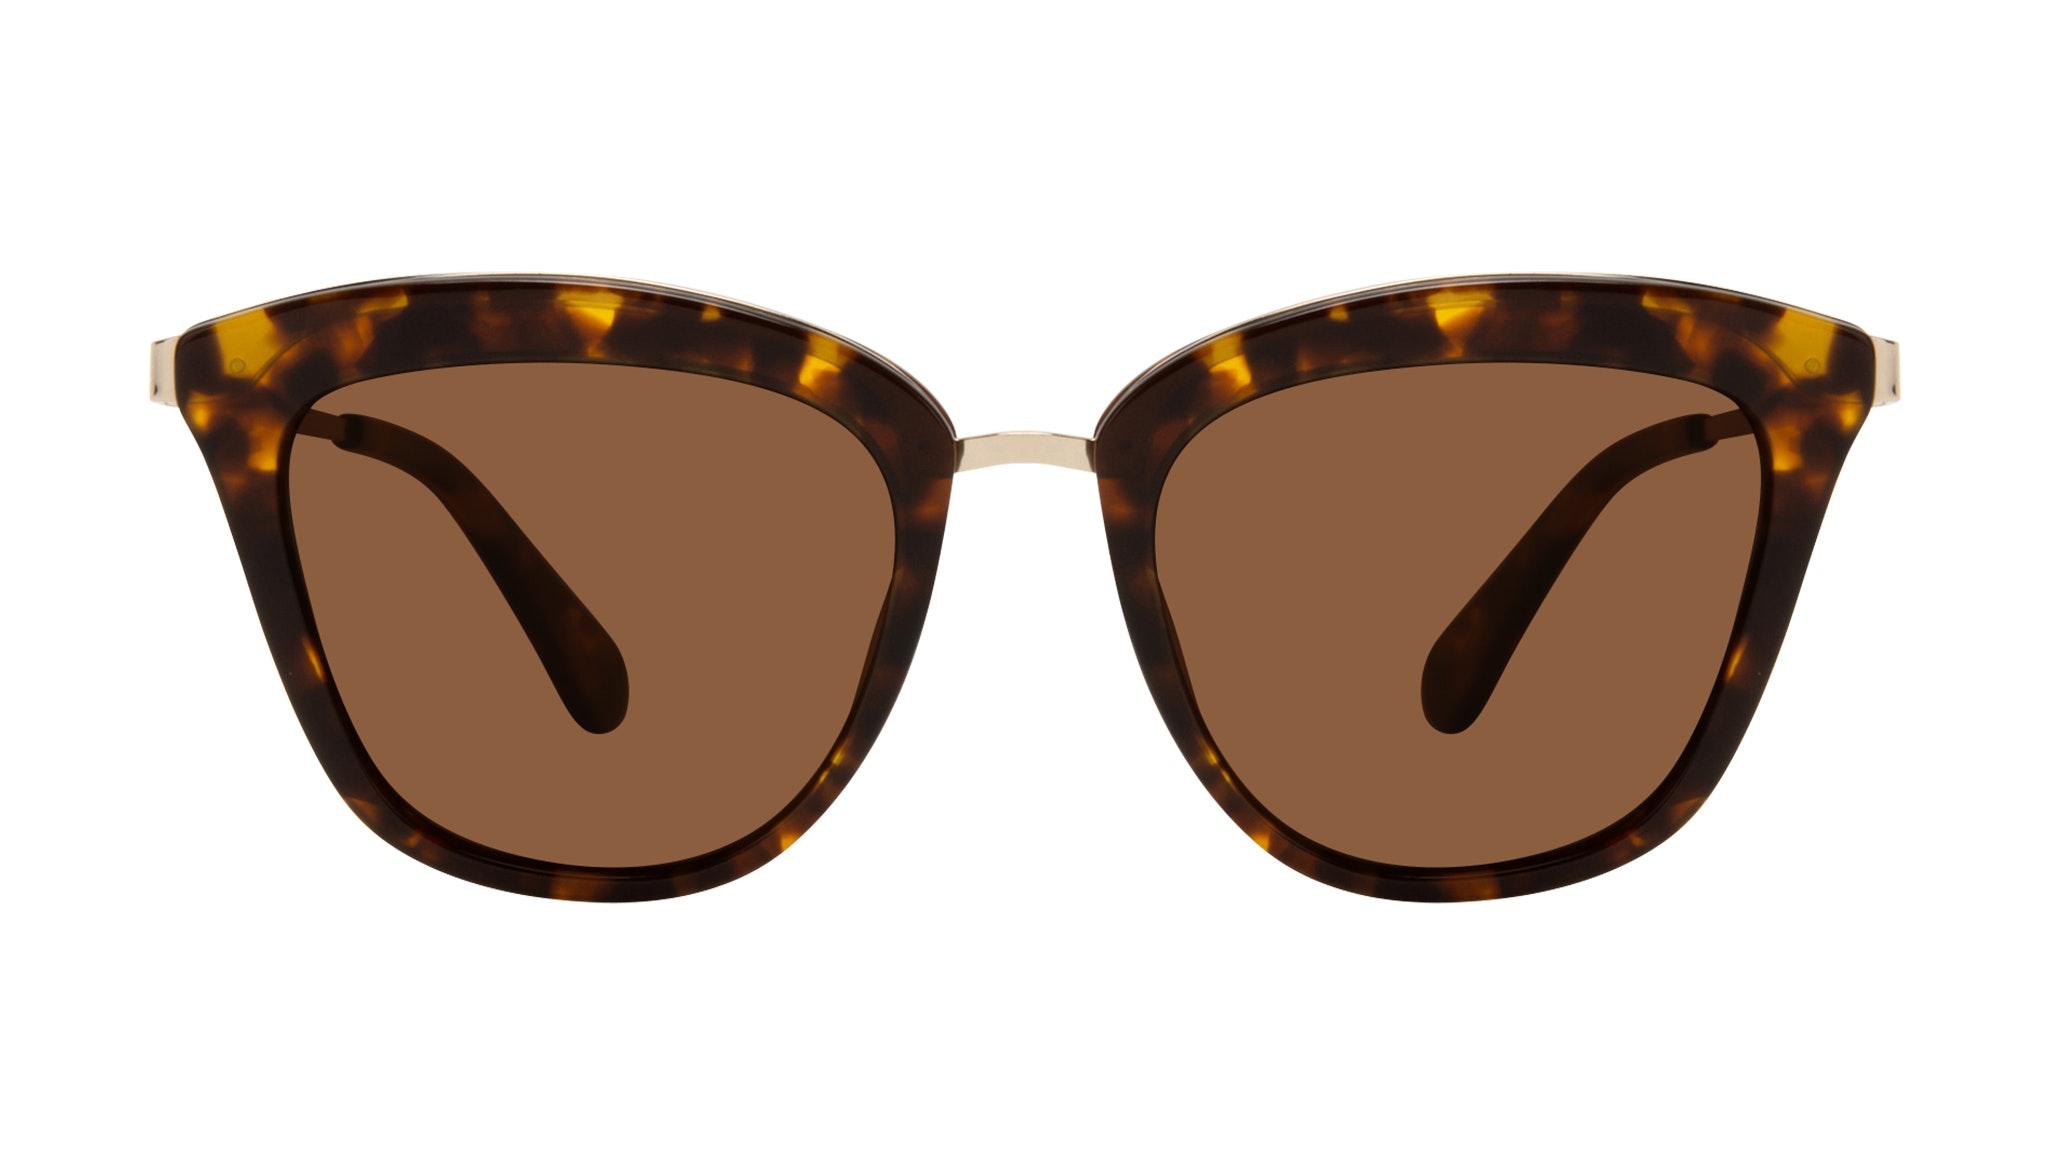 Affordable Fashion Glasses Rectangle Square Sunglasses Women More Tortoise Front